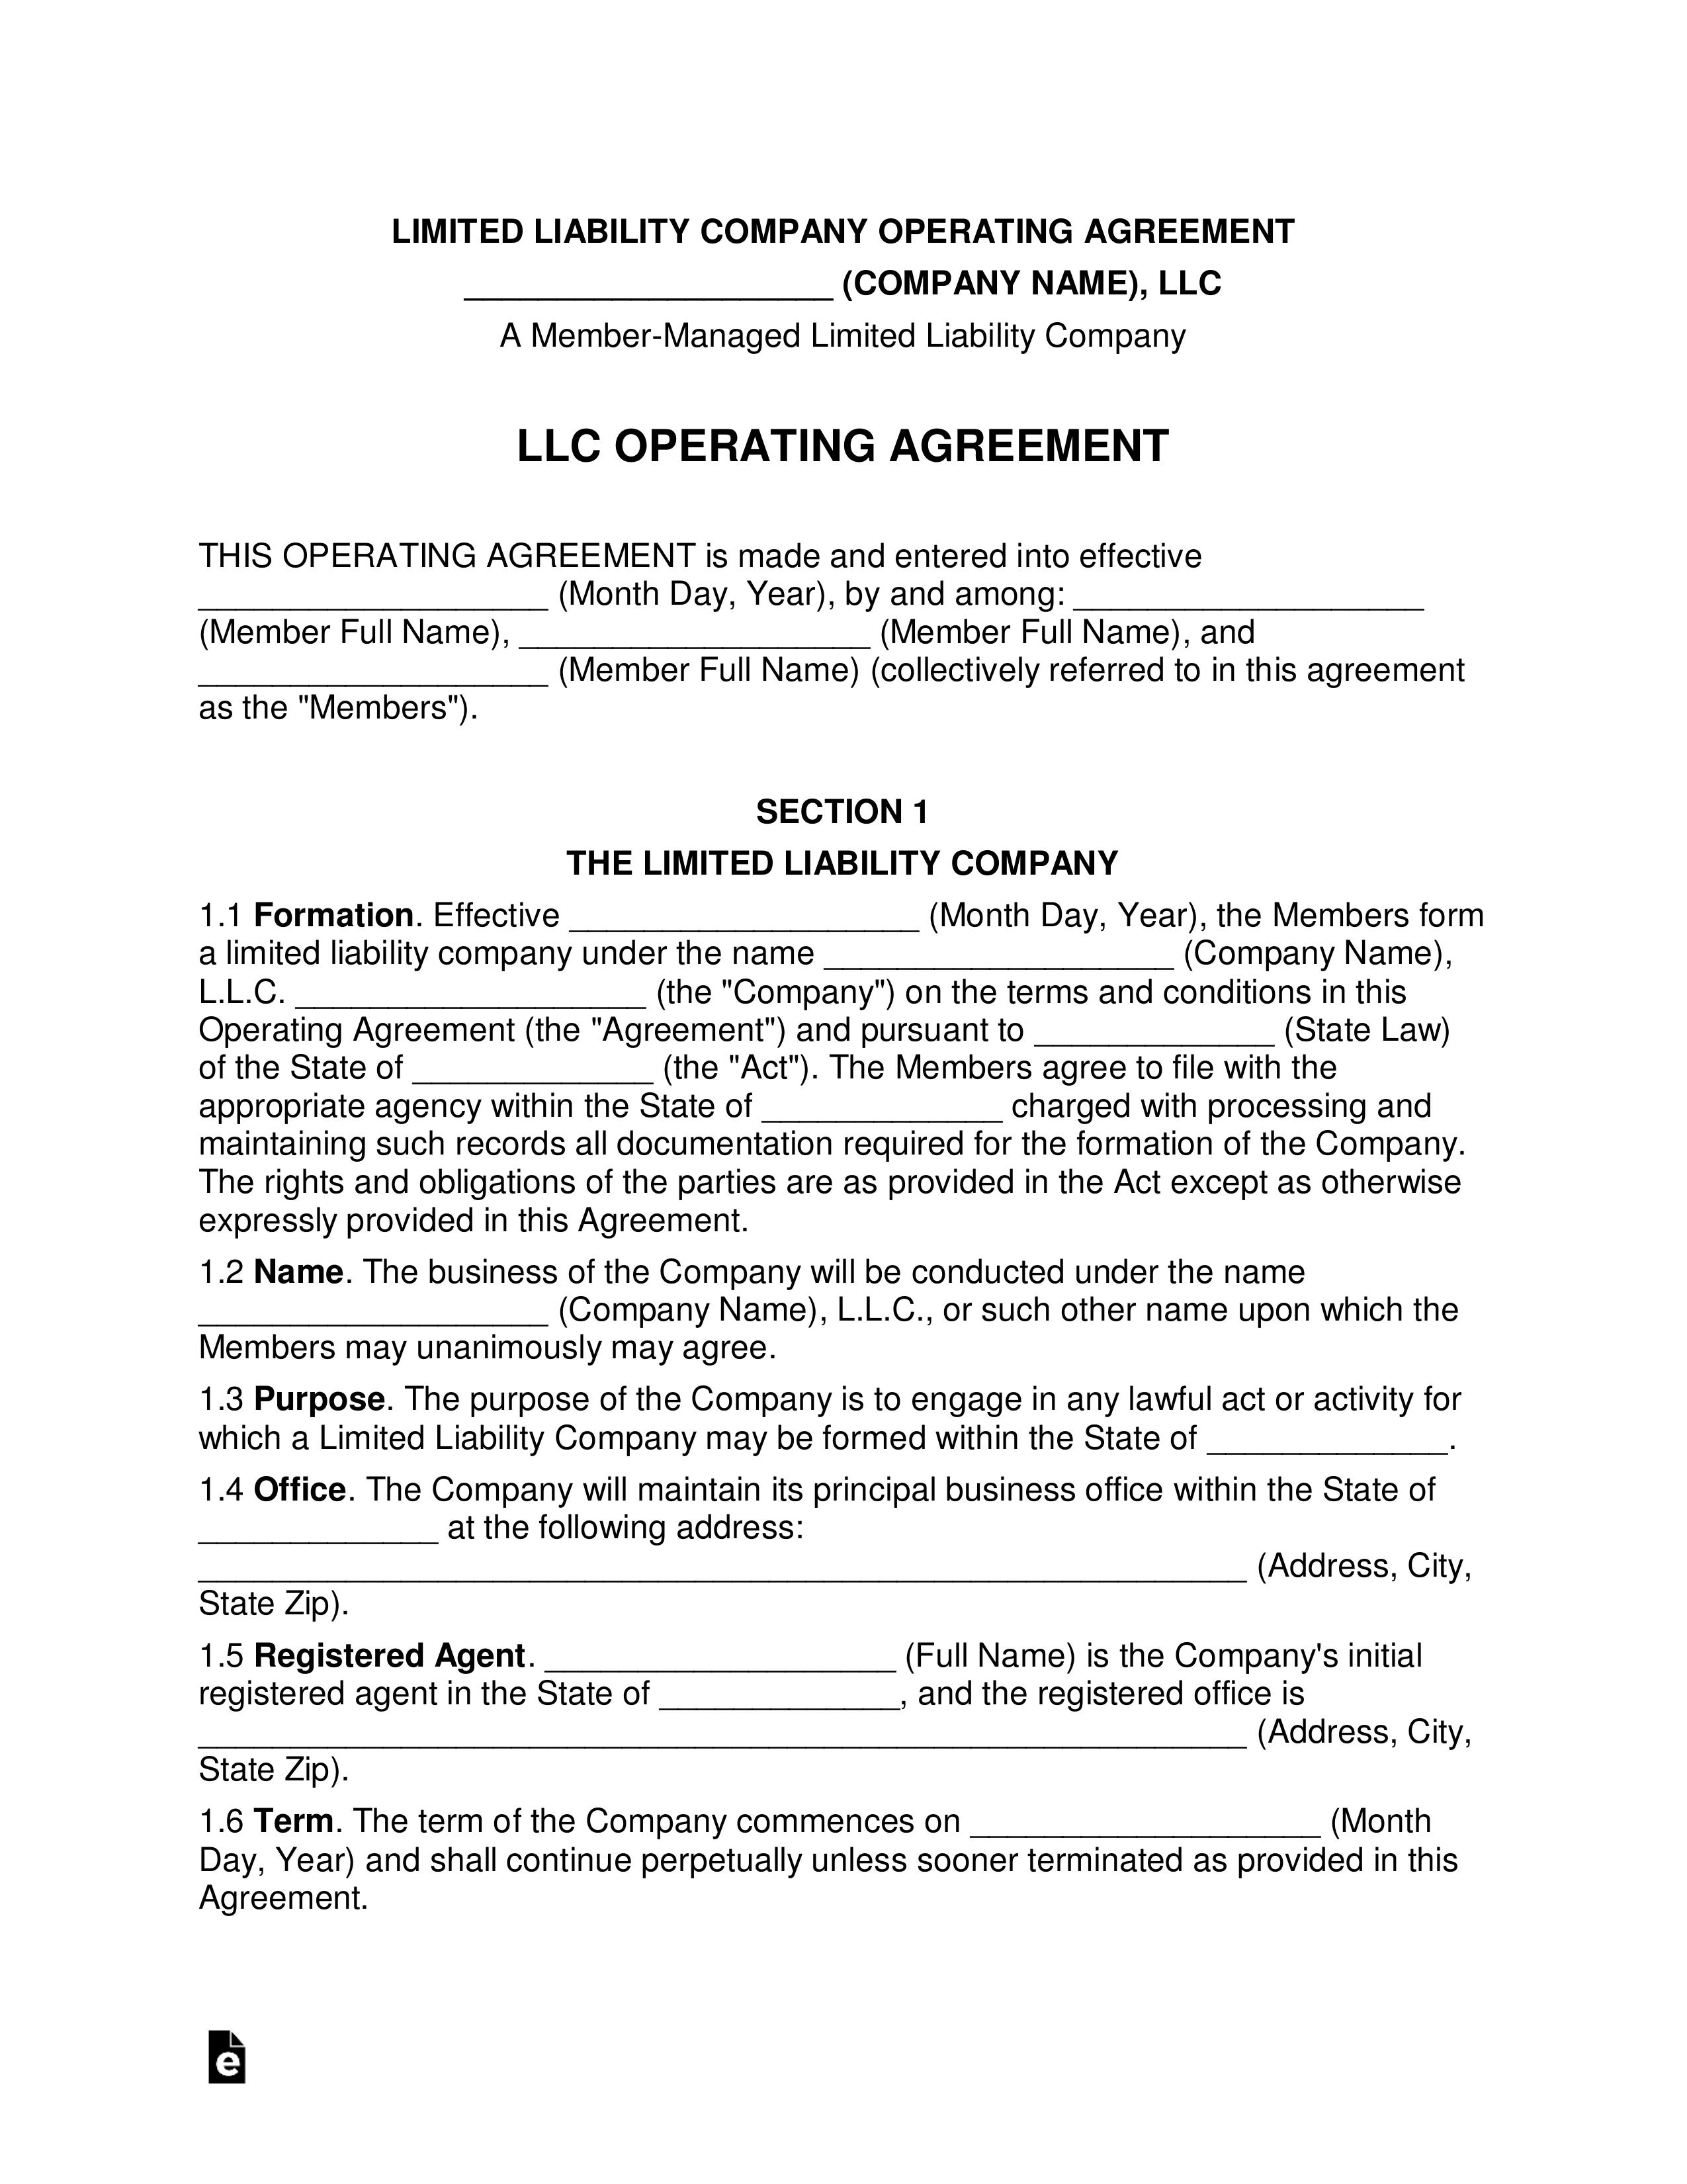 Michigan Llc Operating Agreement Template